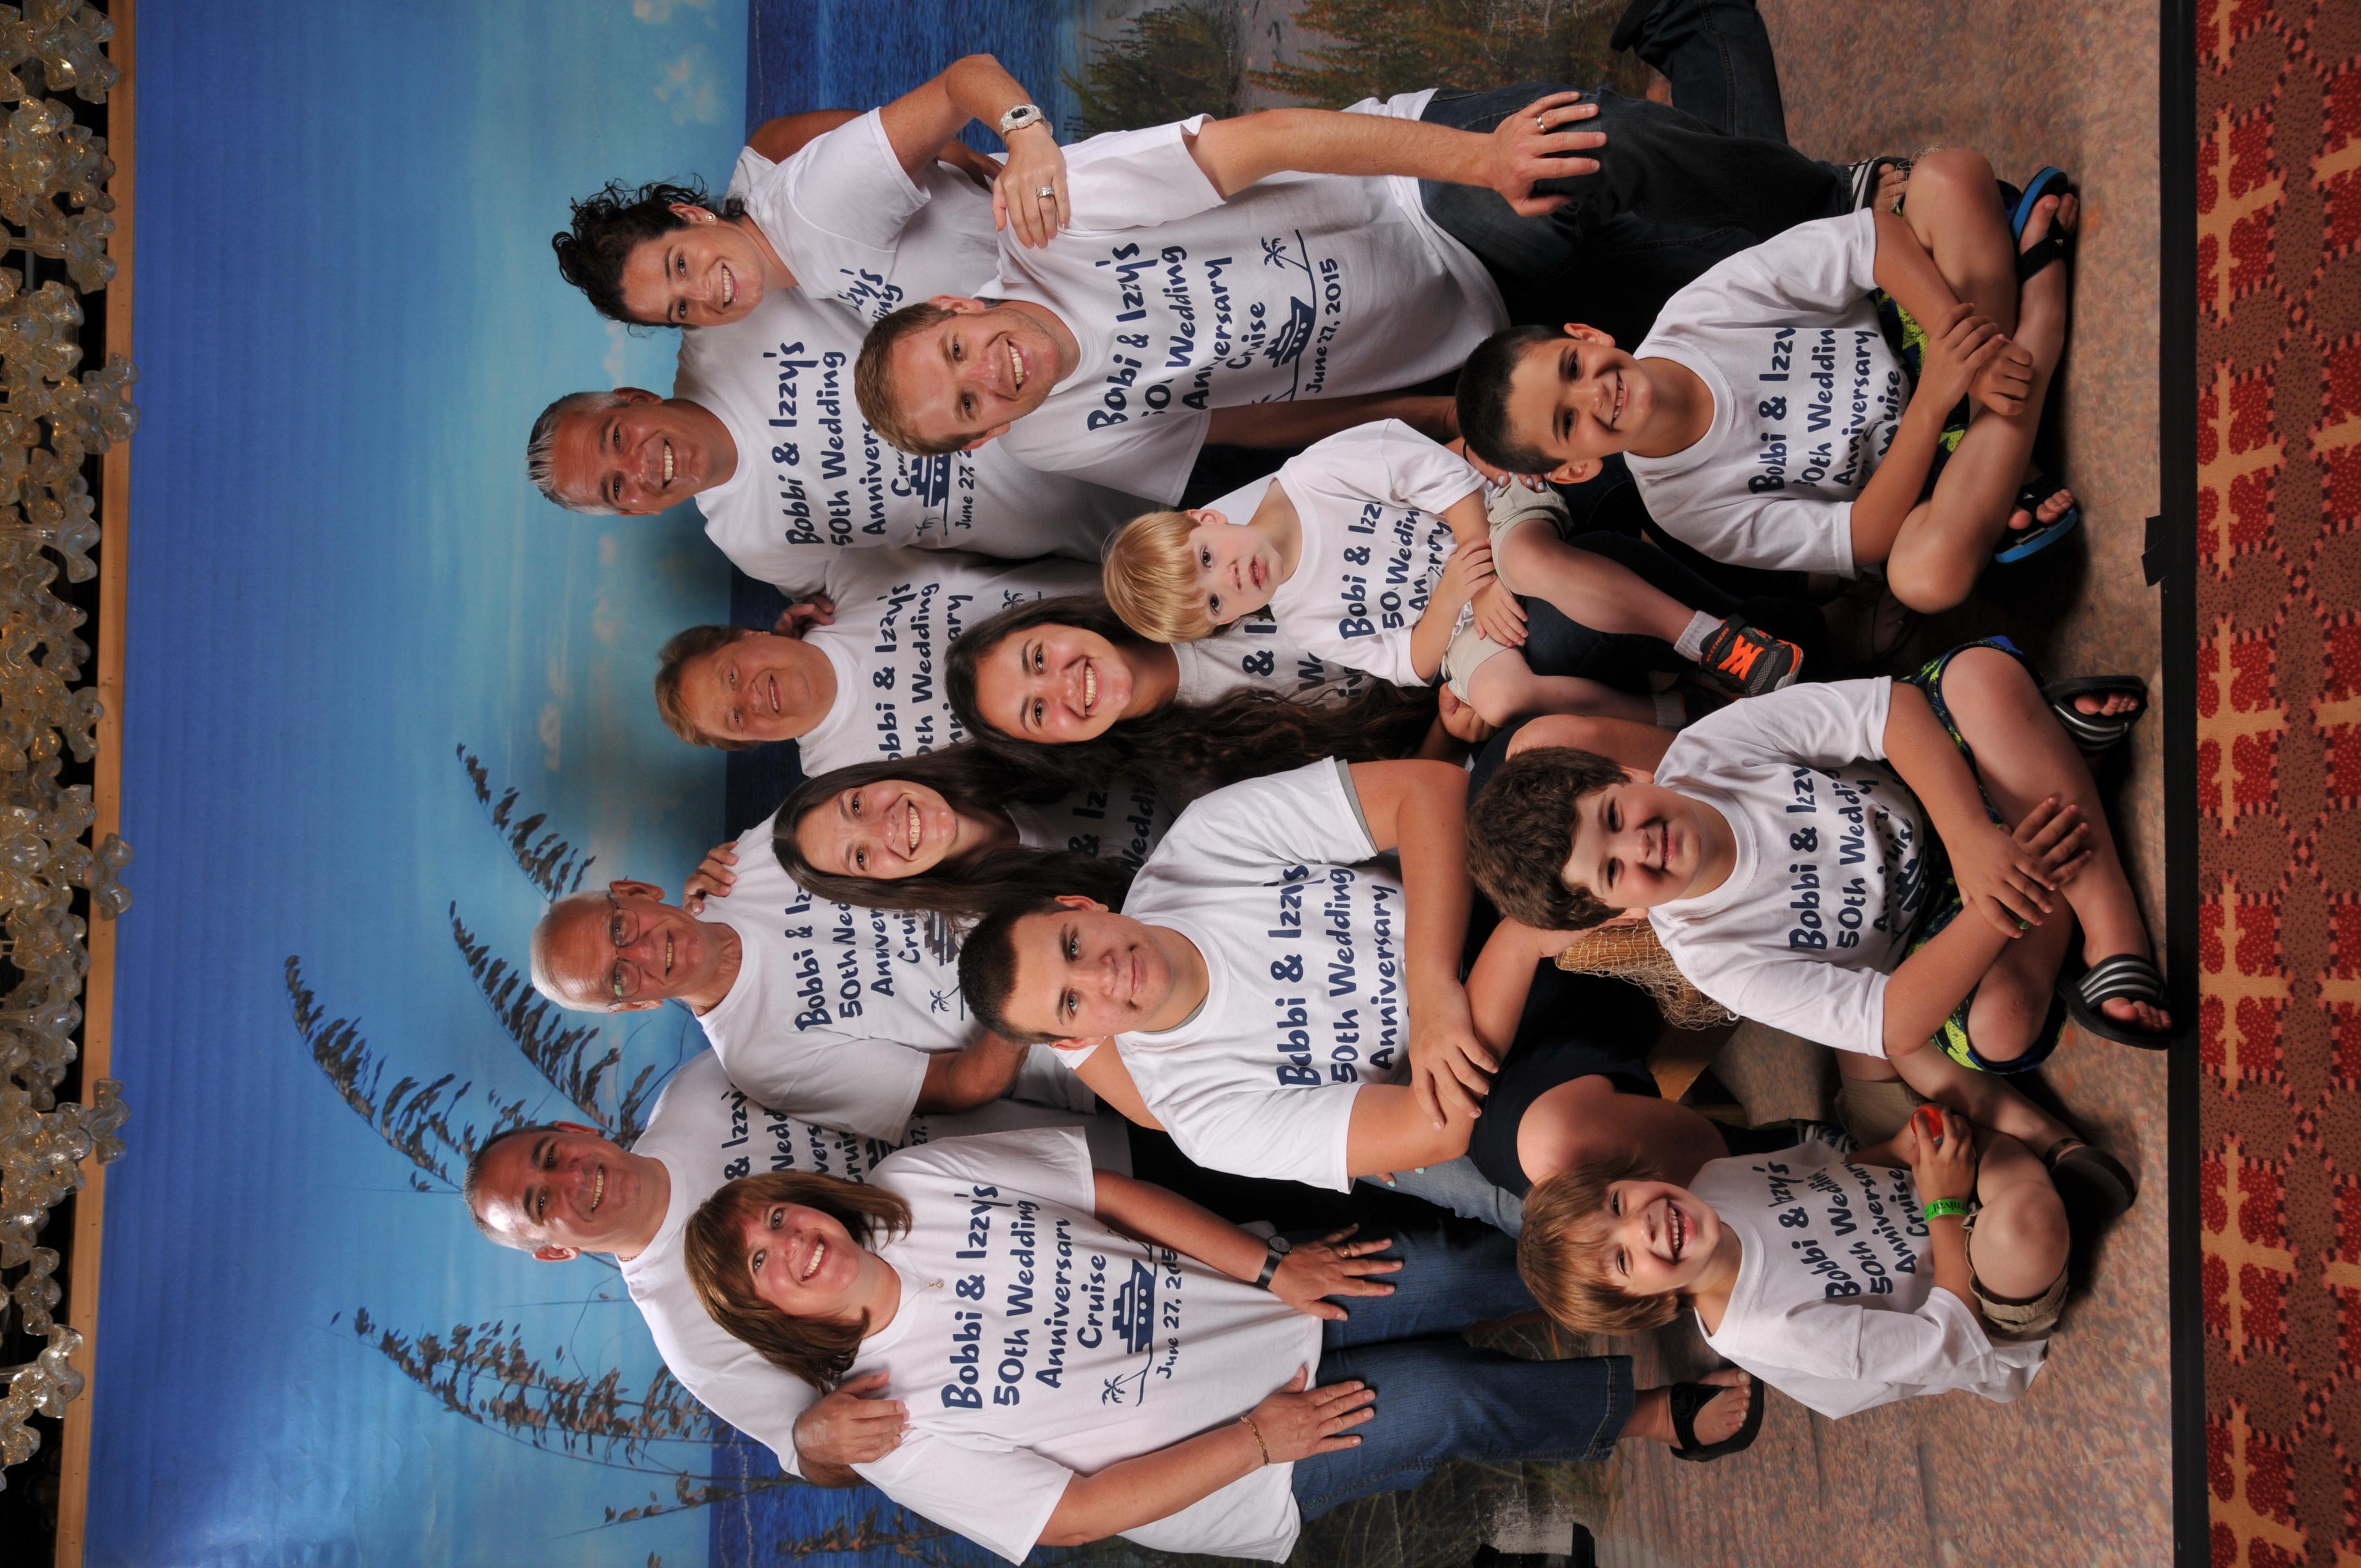 Wedding T Shirt Ideas: Custom T-Shirts For 50 Years Of Wedding Bliss